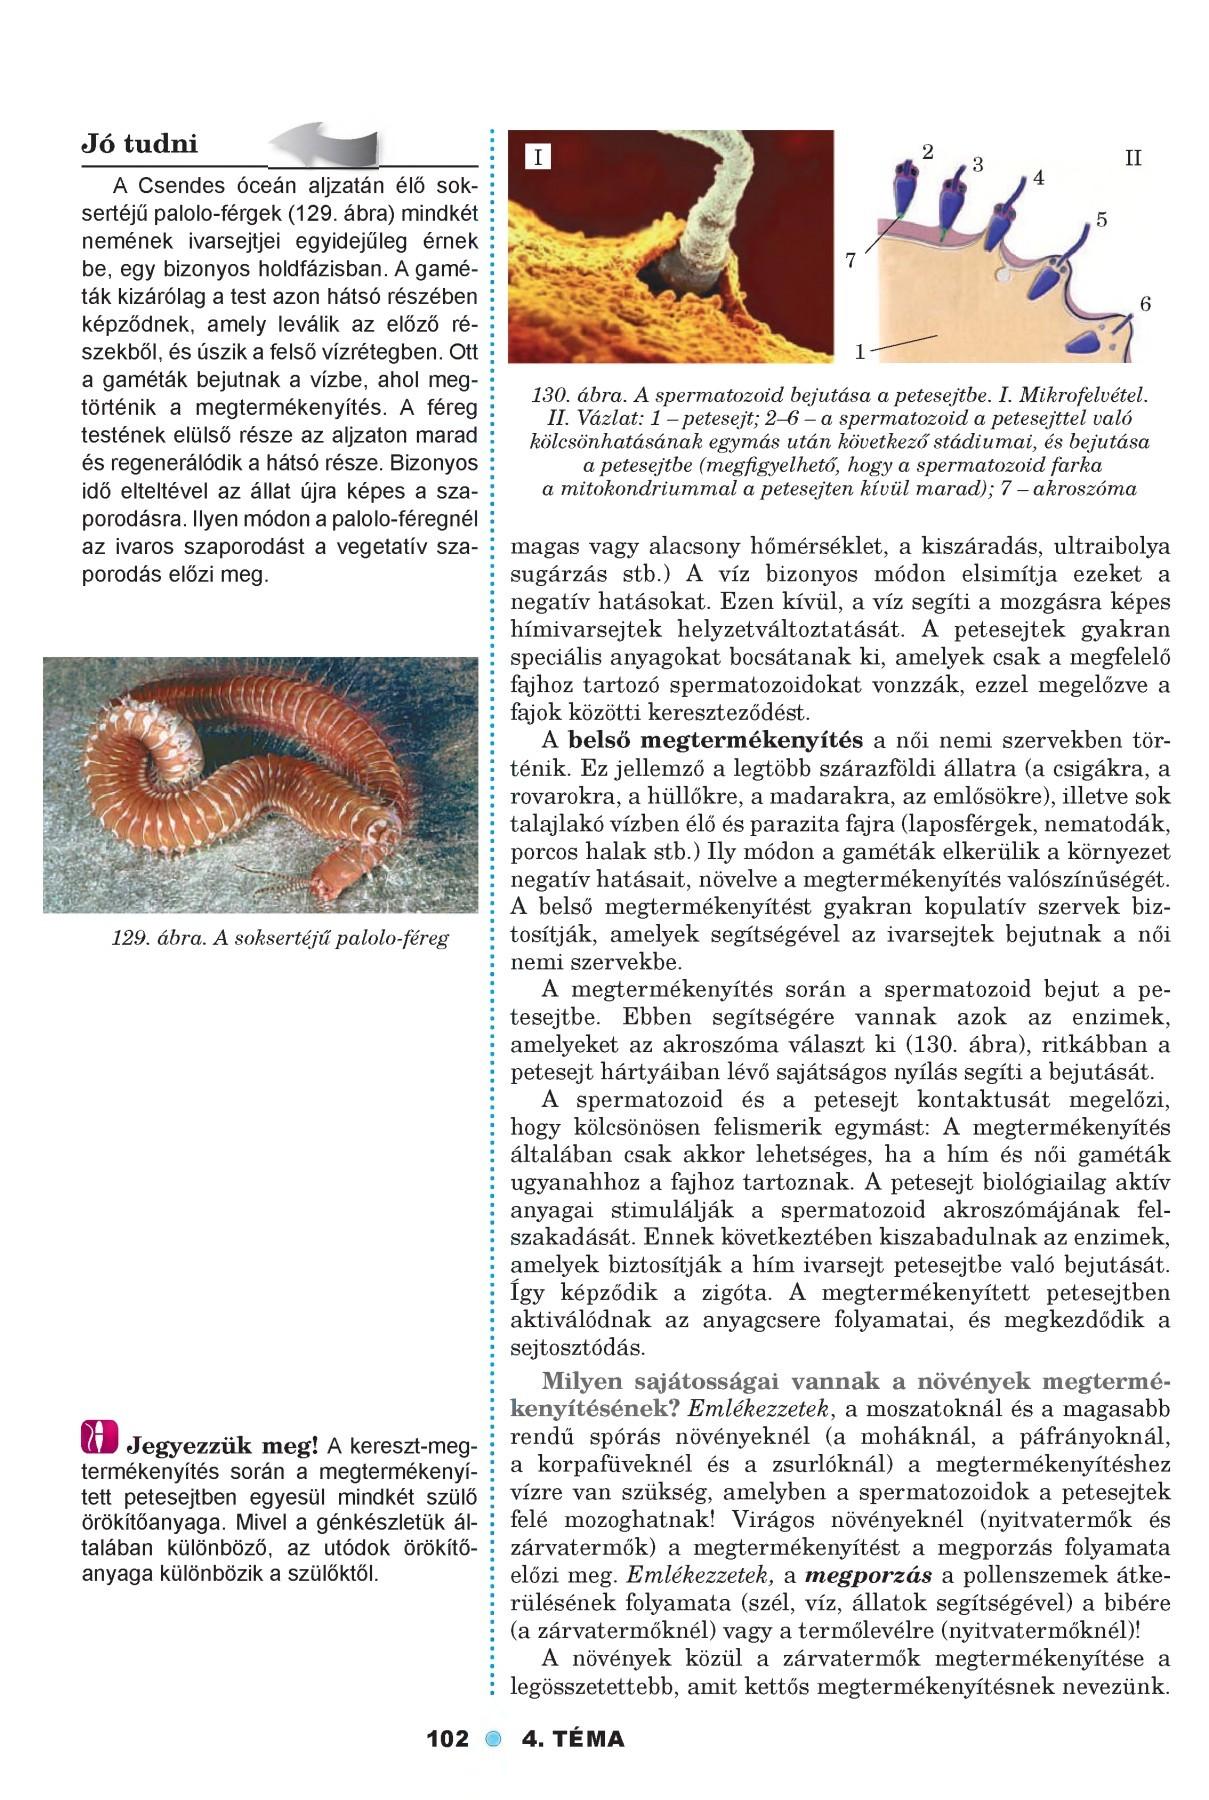 parazita az almafán)